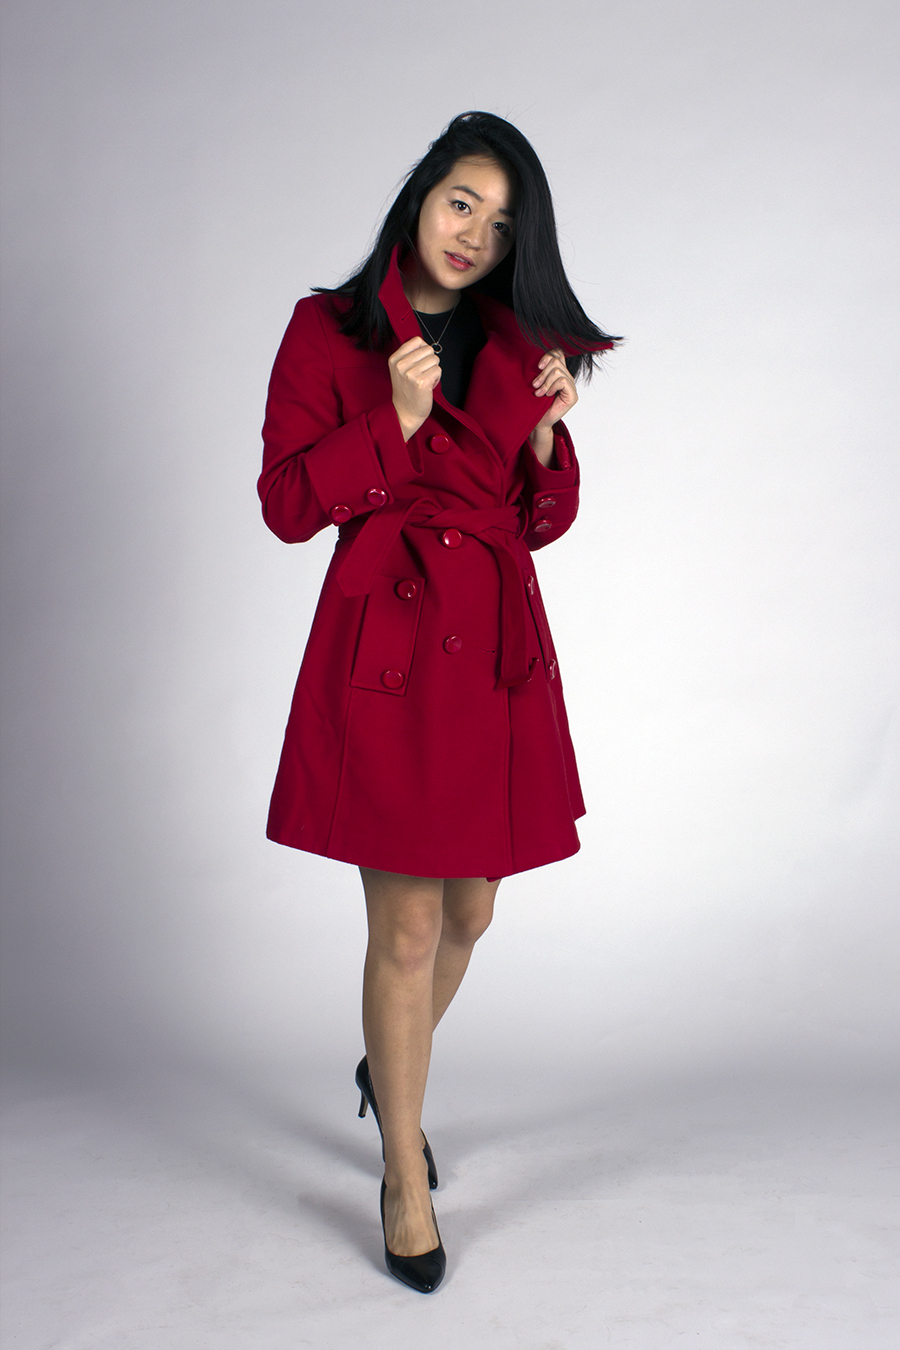 Sharon_Song_fashion_photography_millenial_professional_dres_Tony_Ward_Studio_women_red_coat